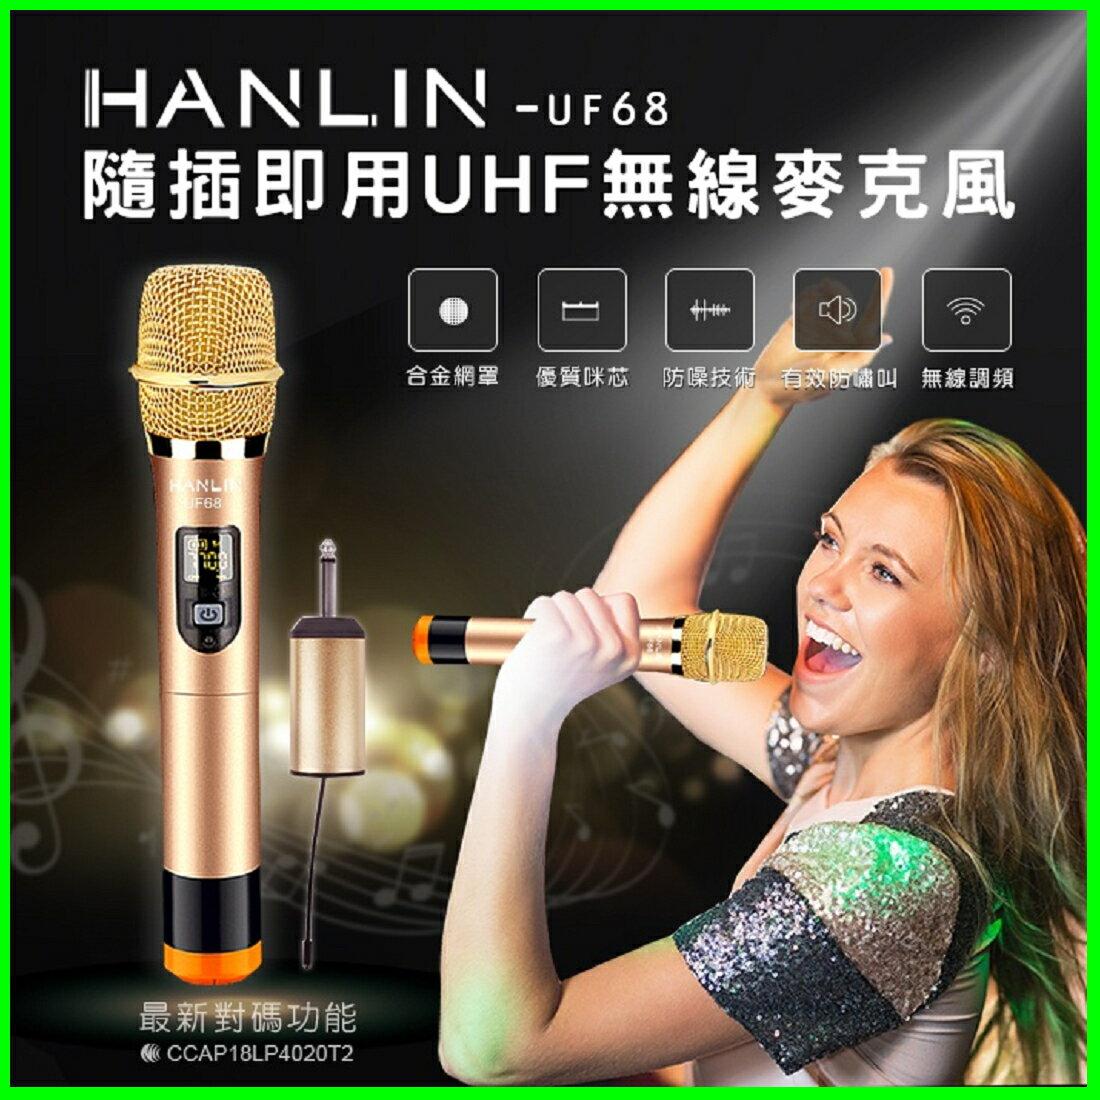 HANLIN-UF68 隨插即用UHF無線麥克風 K歌麥克風 唱歌神器 液晶顯示 6.3mm接收器轉3.5mm【凱益】